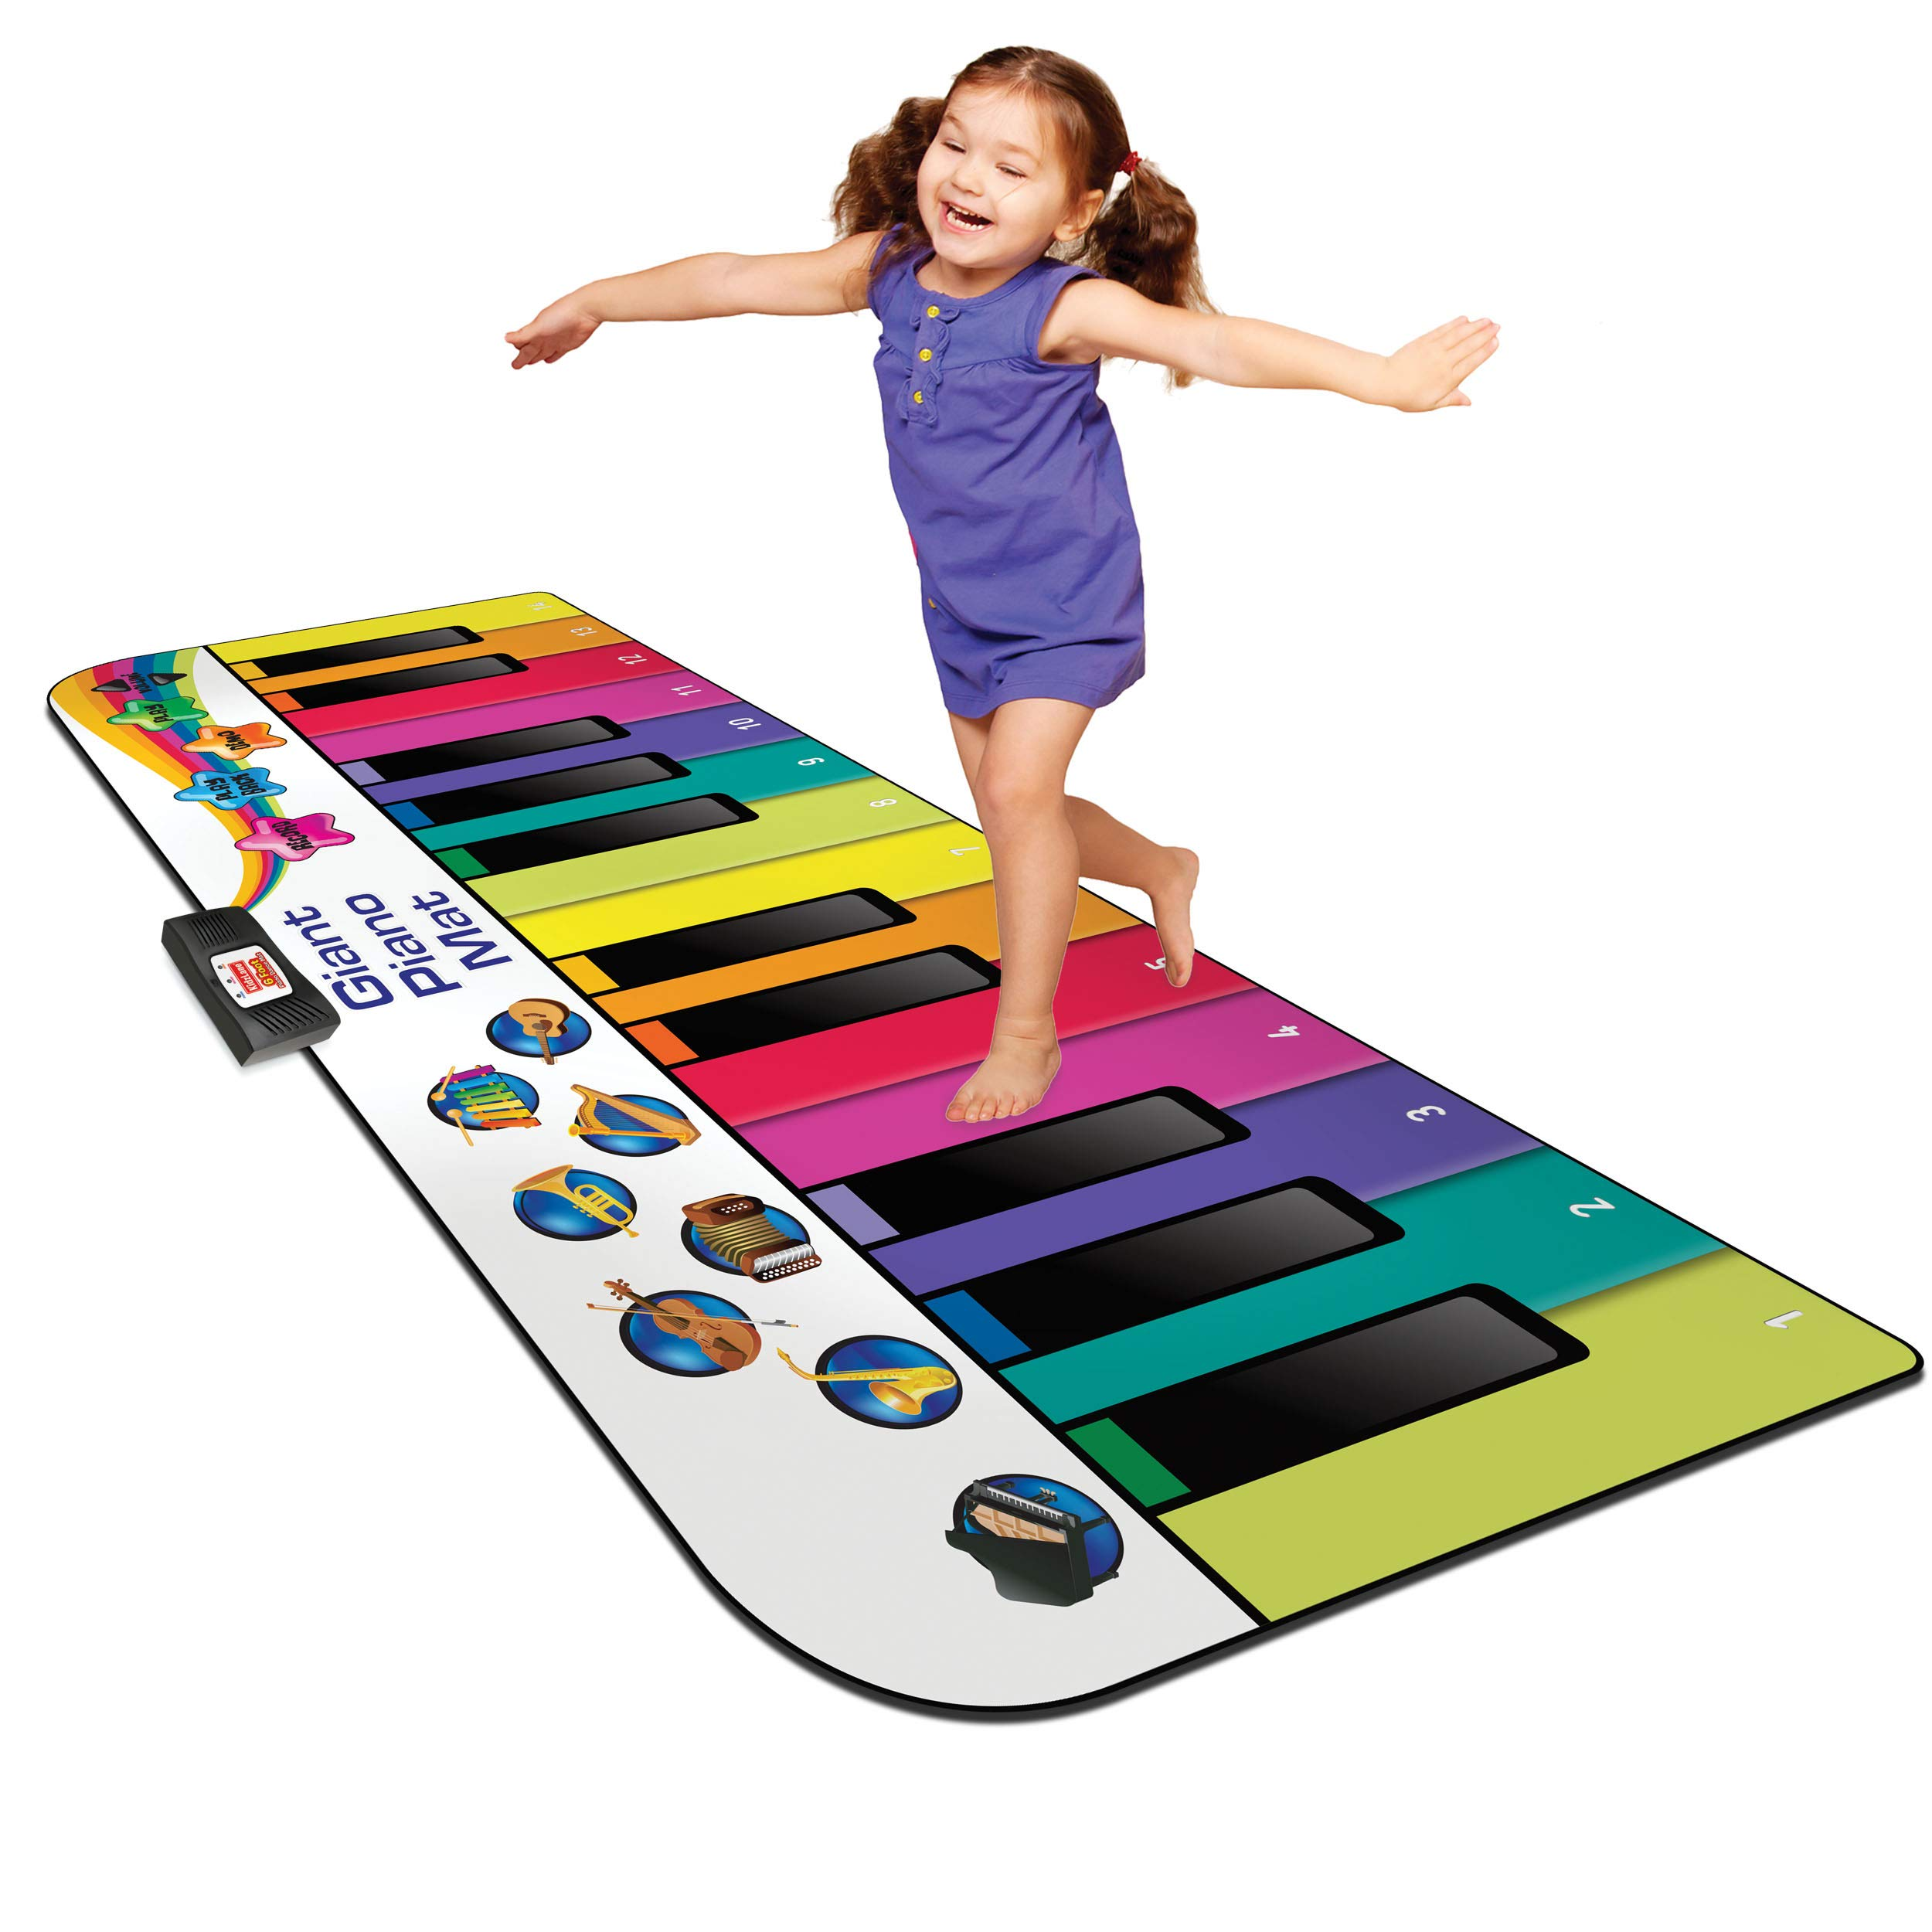 Kidzlane Floor Piano Mat: Jumbo 6 Foot Musical Keyboard Playmat for Toddlers and Kids by Kidzlane (Image #1)